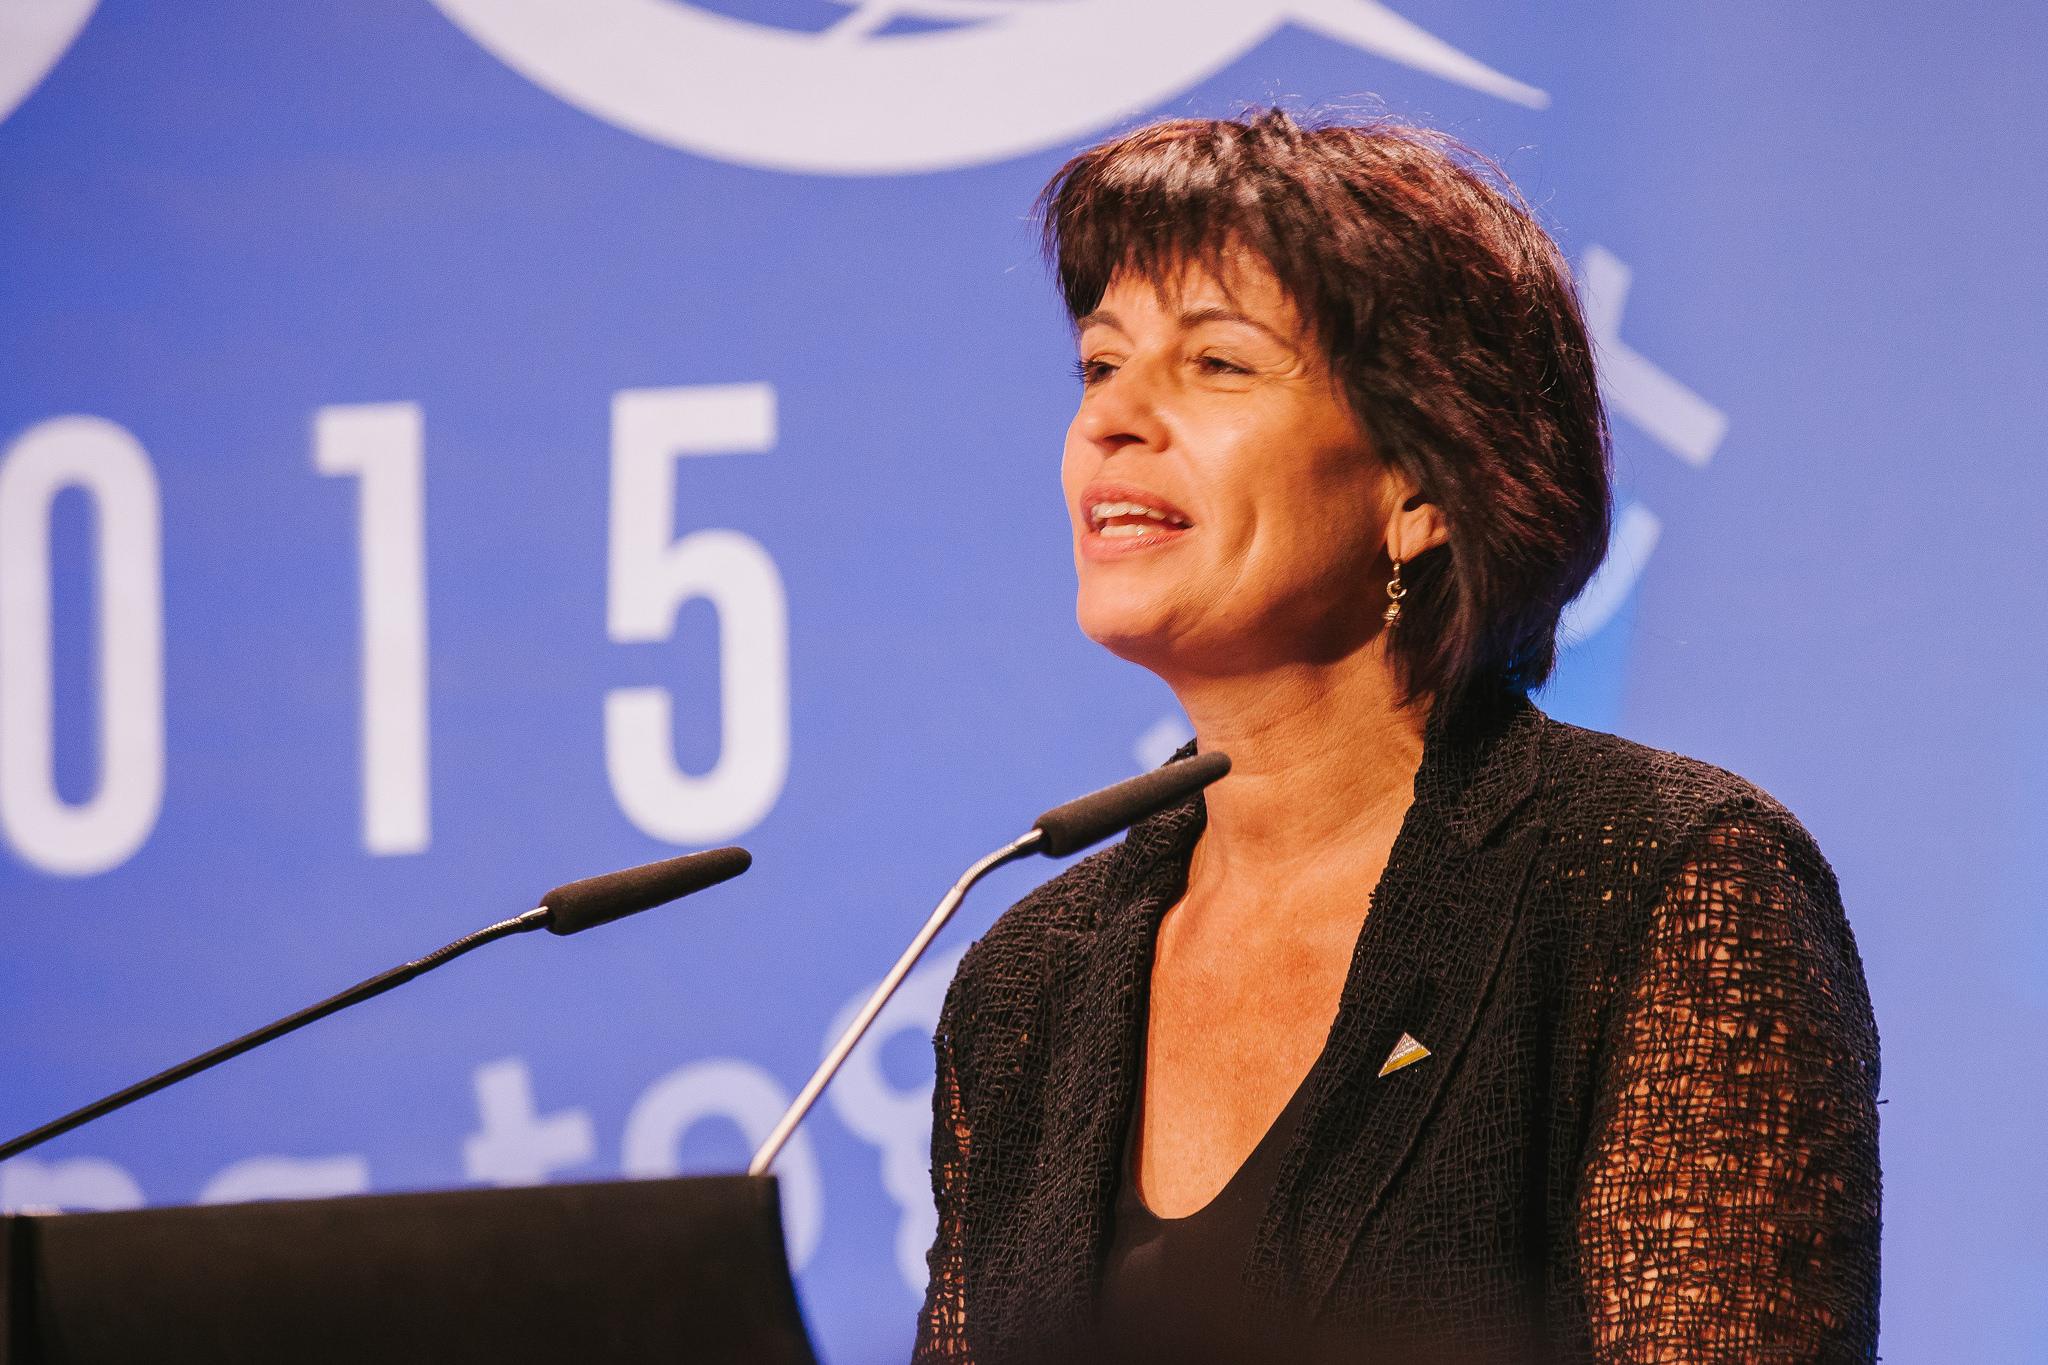 Doris Leuthard, Minister of Environment, Transport, Energy and Communications of Switzerland